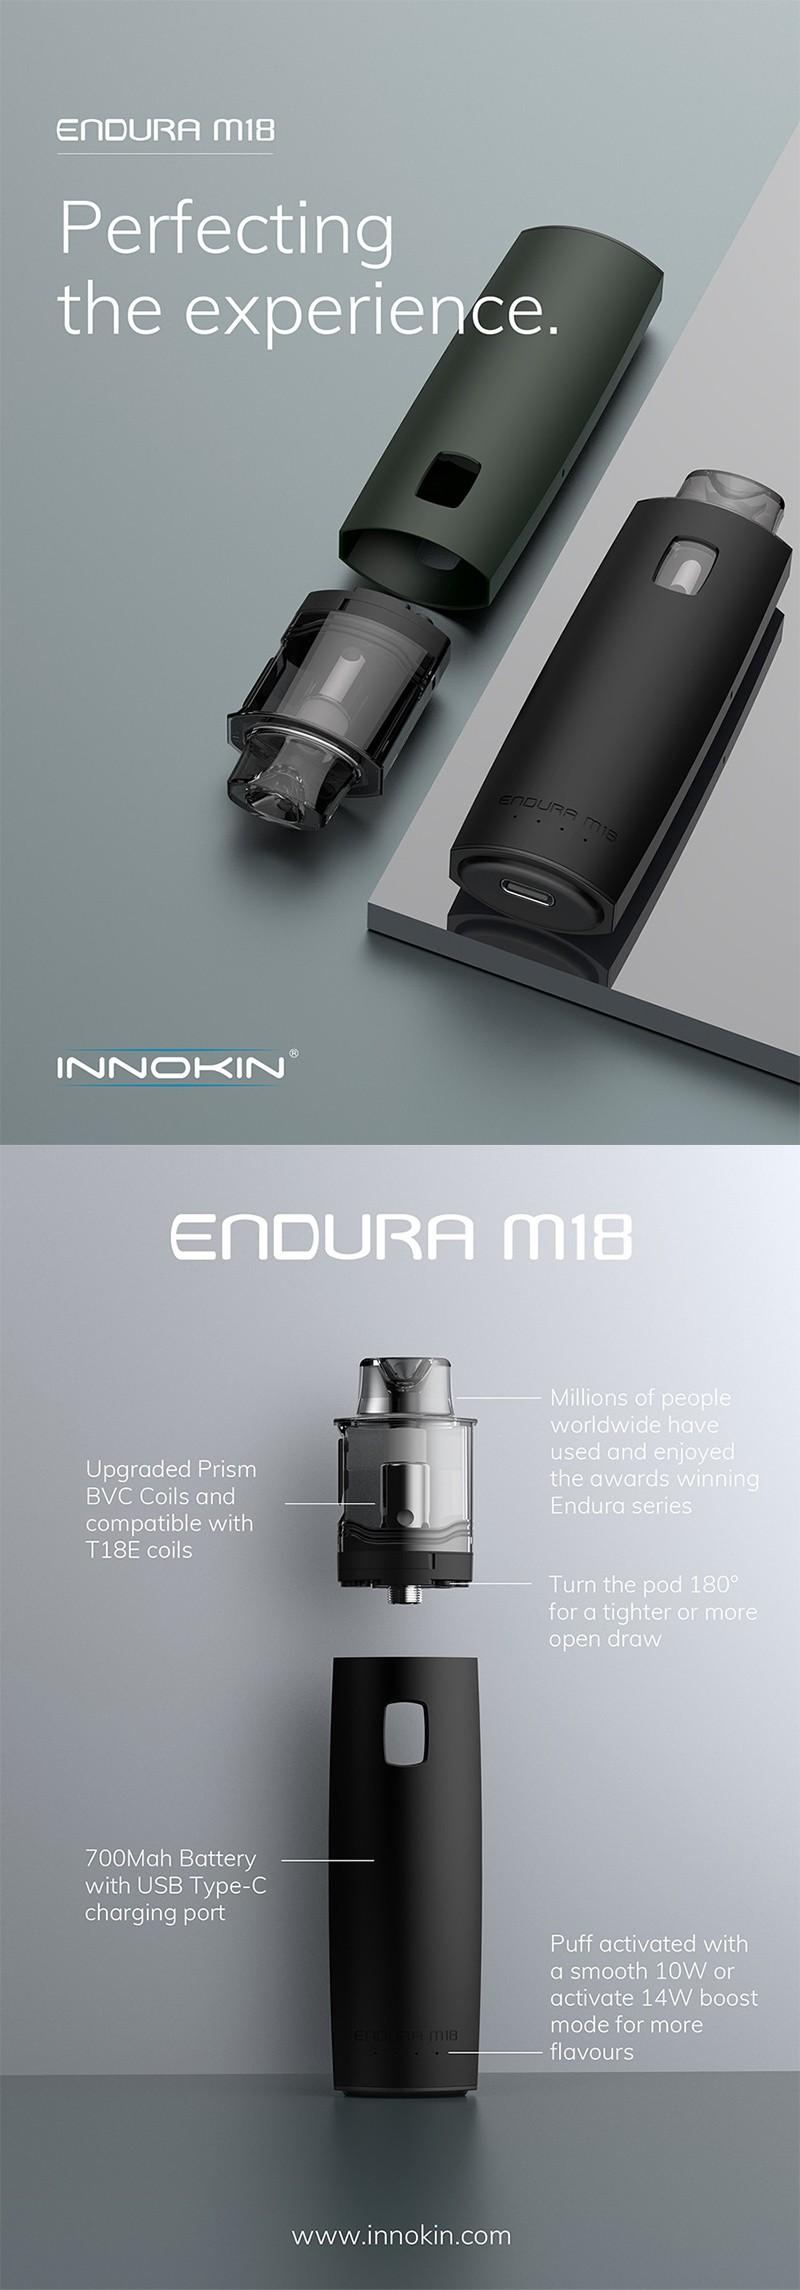 Authentic Innokin Endura M18 Pod System